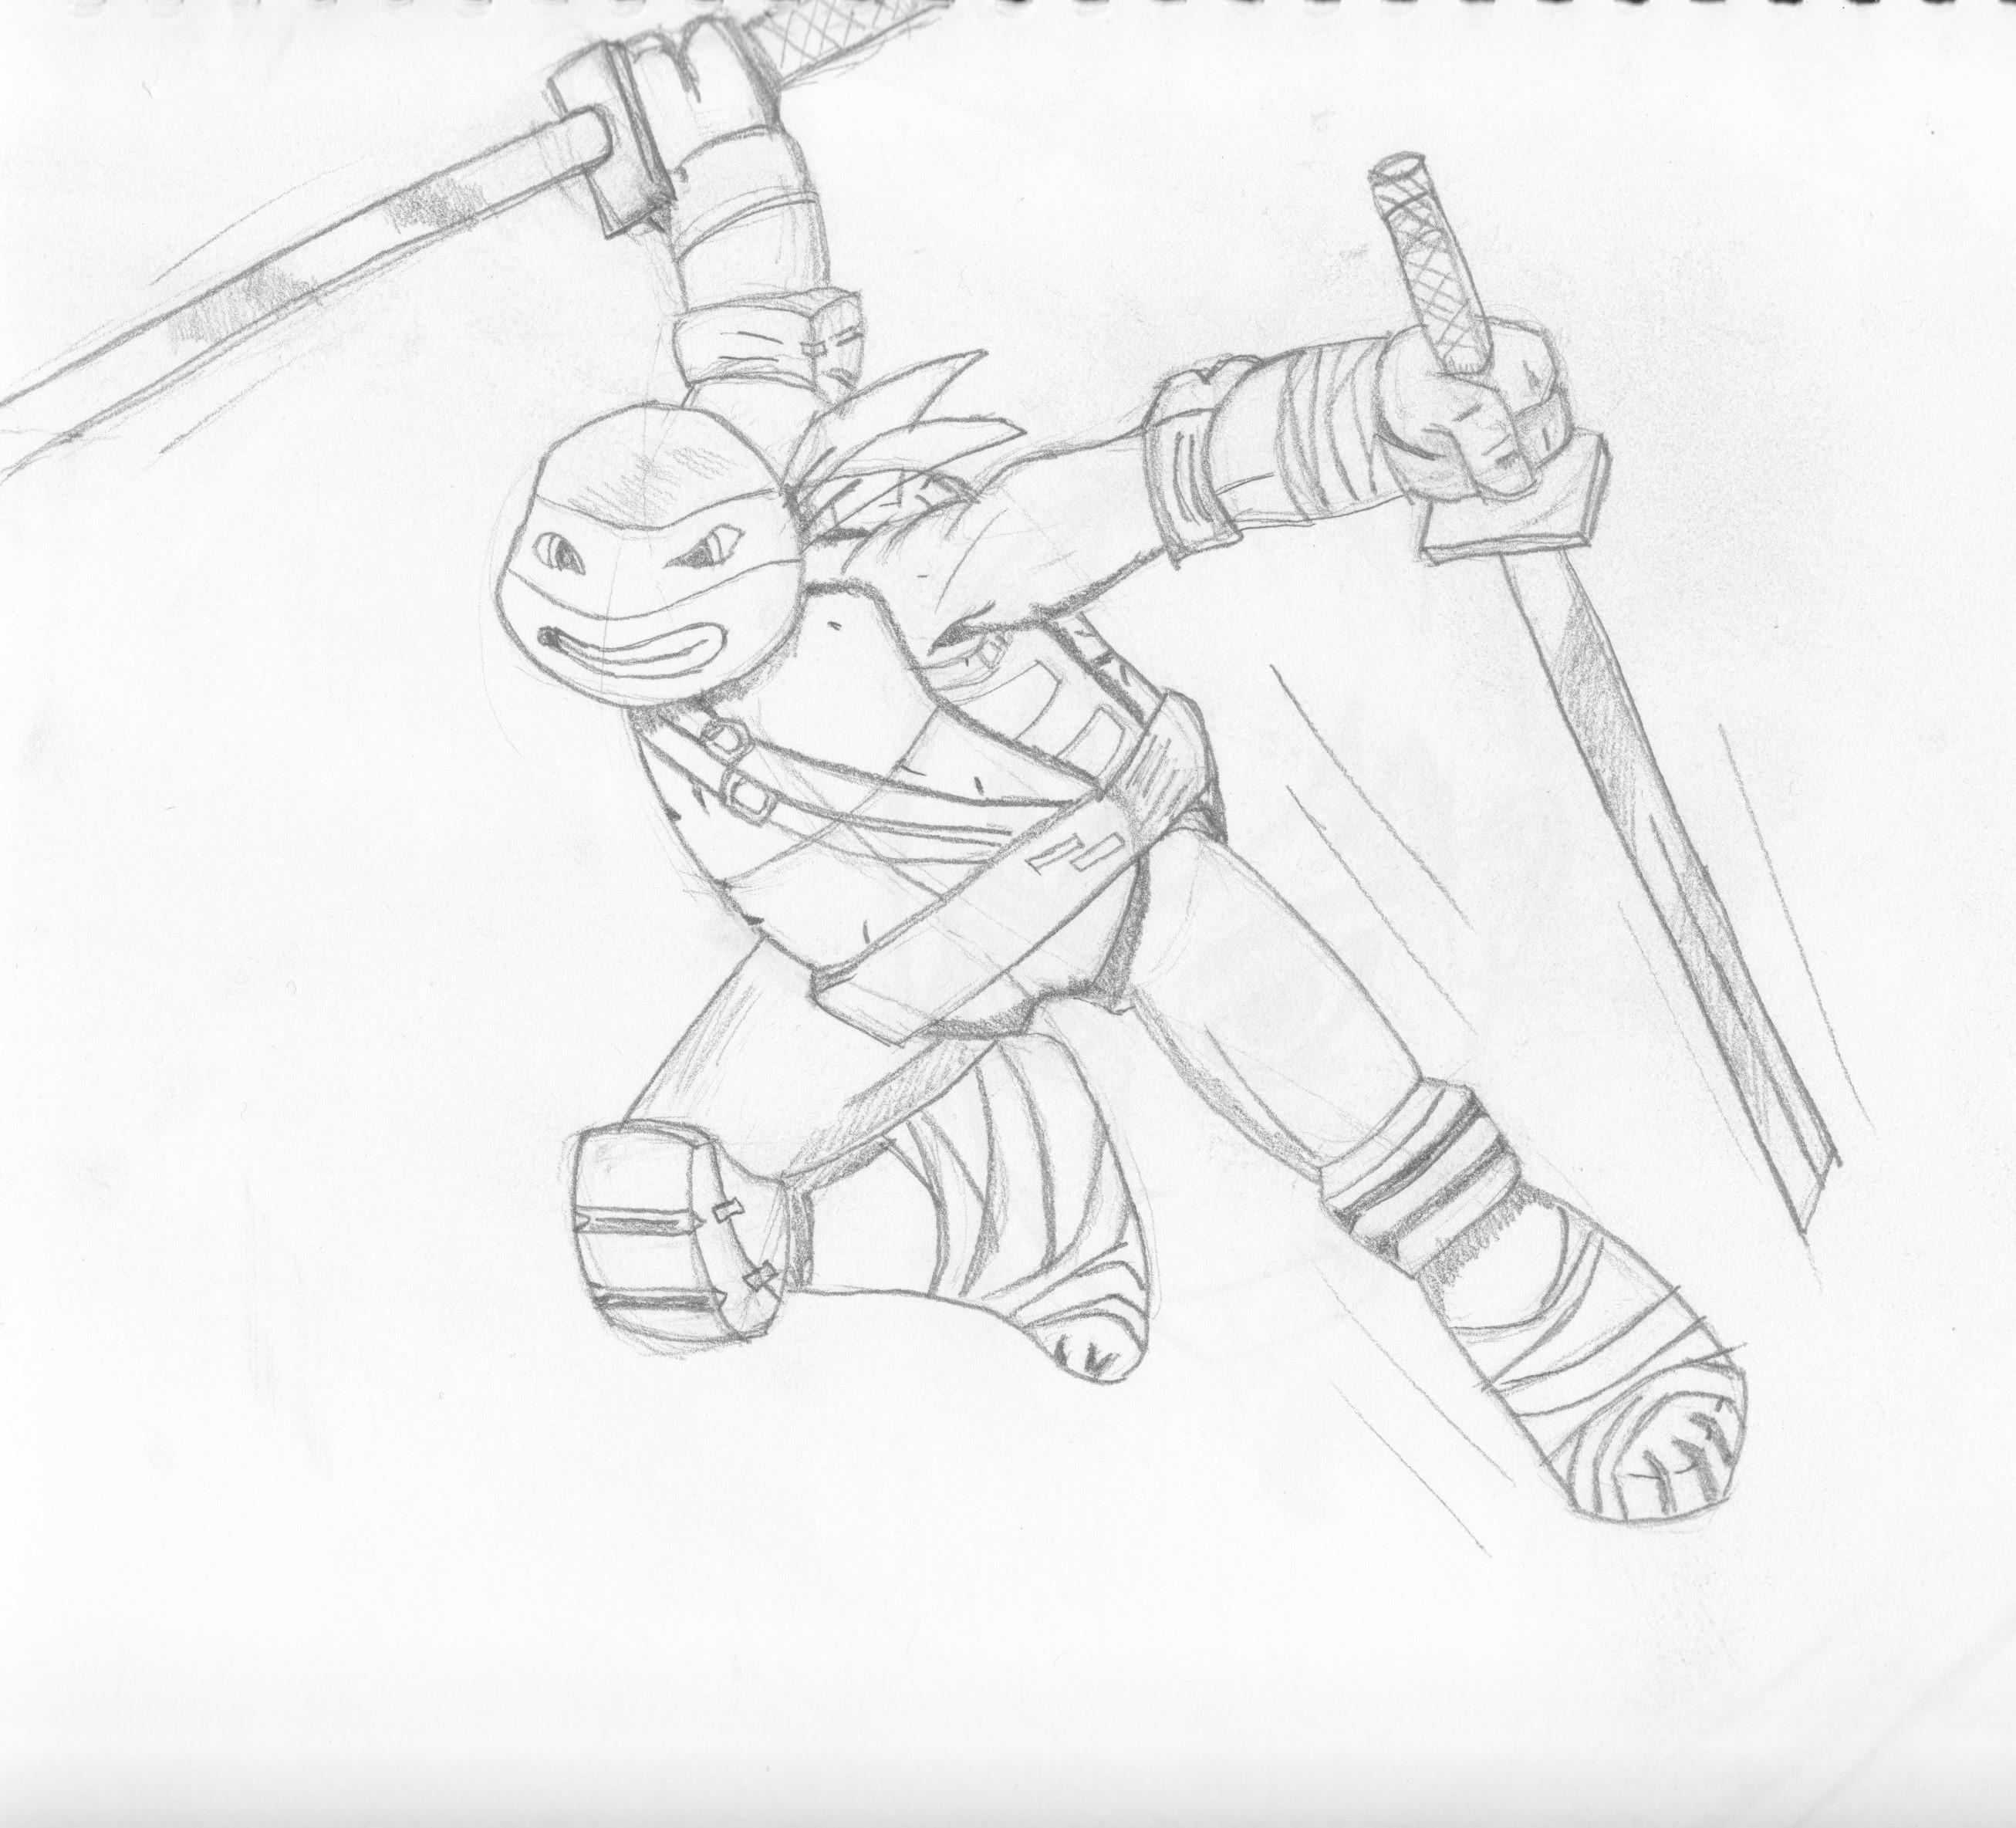 2613x2369 How To Draw Ninja Turtles Nickelodeon Style